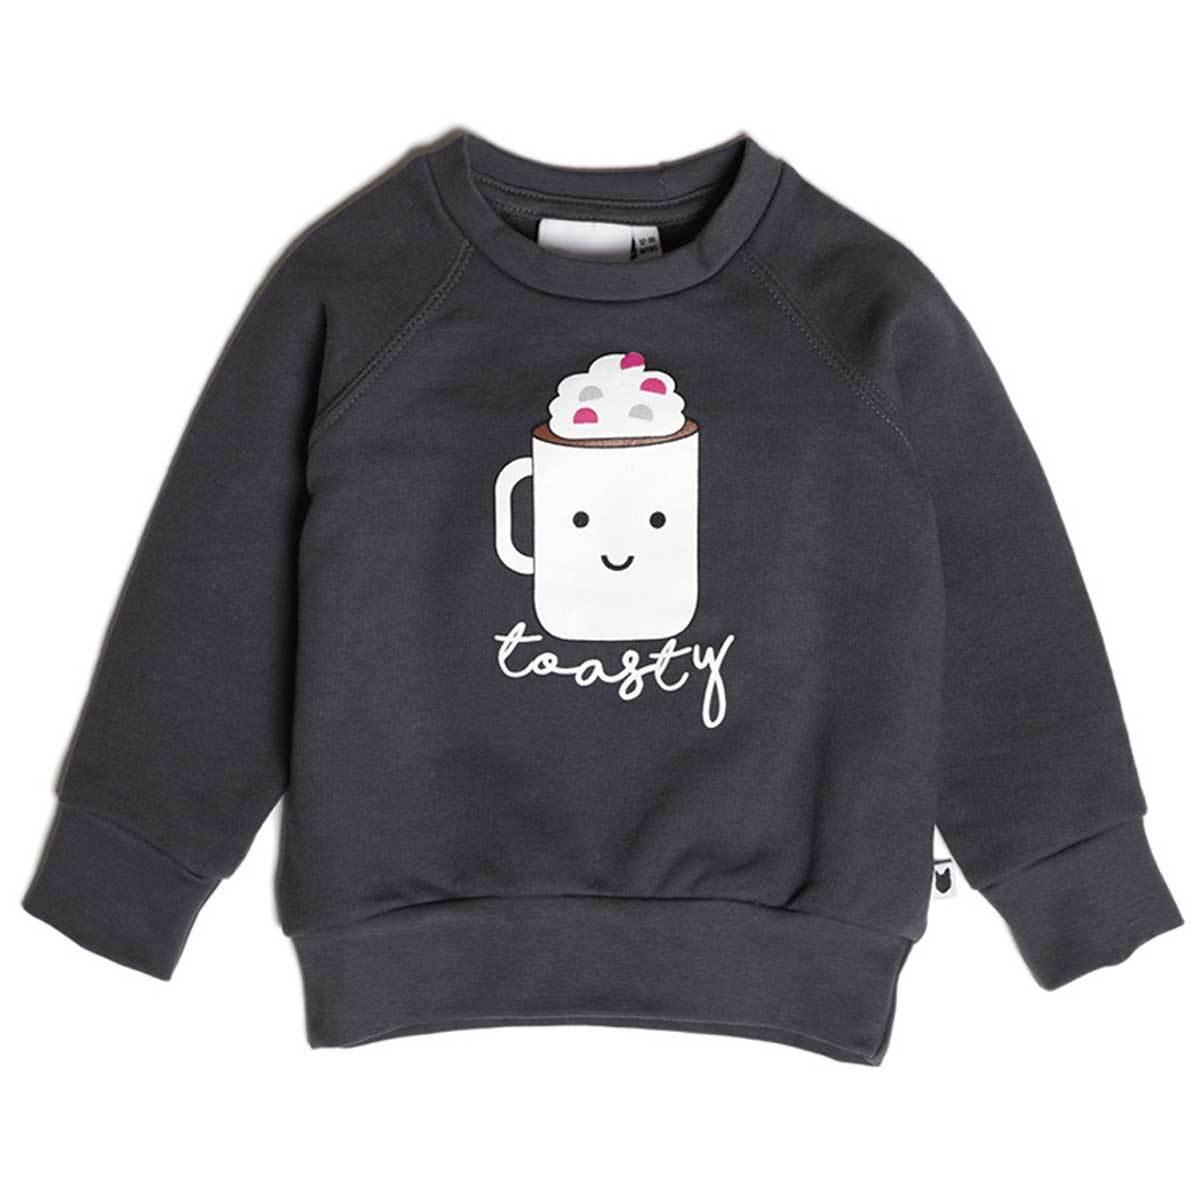 Hauts bébé Sweatshirt Toasty Loopback 0/6 mois Sweatshirt Toasty Loopback 0/6 mois